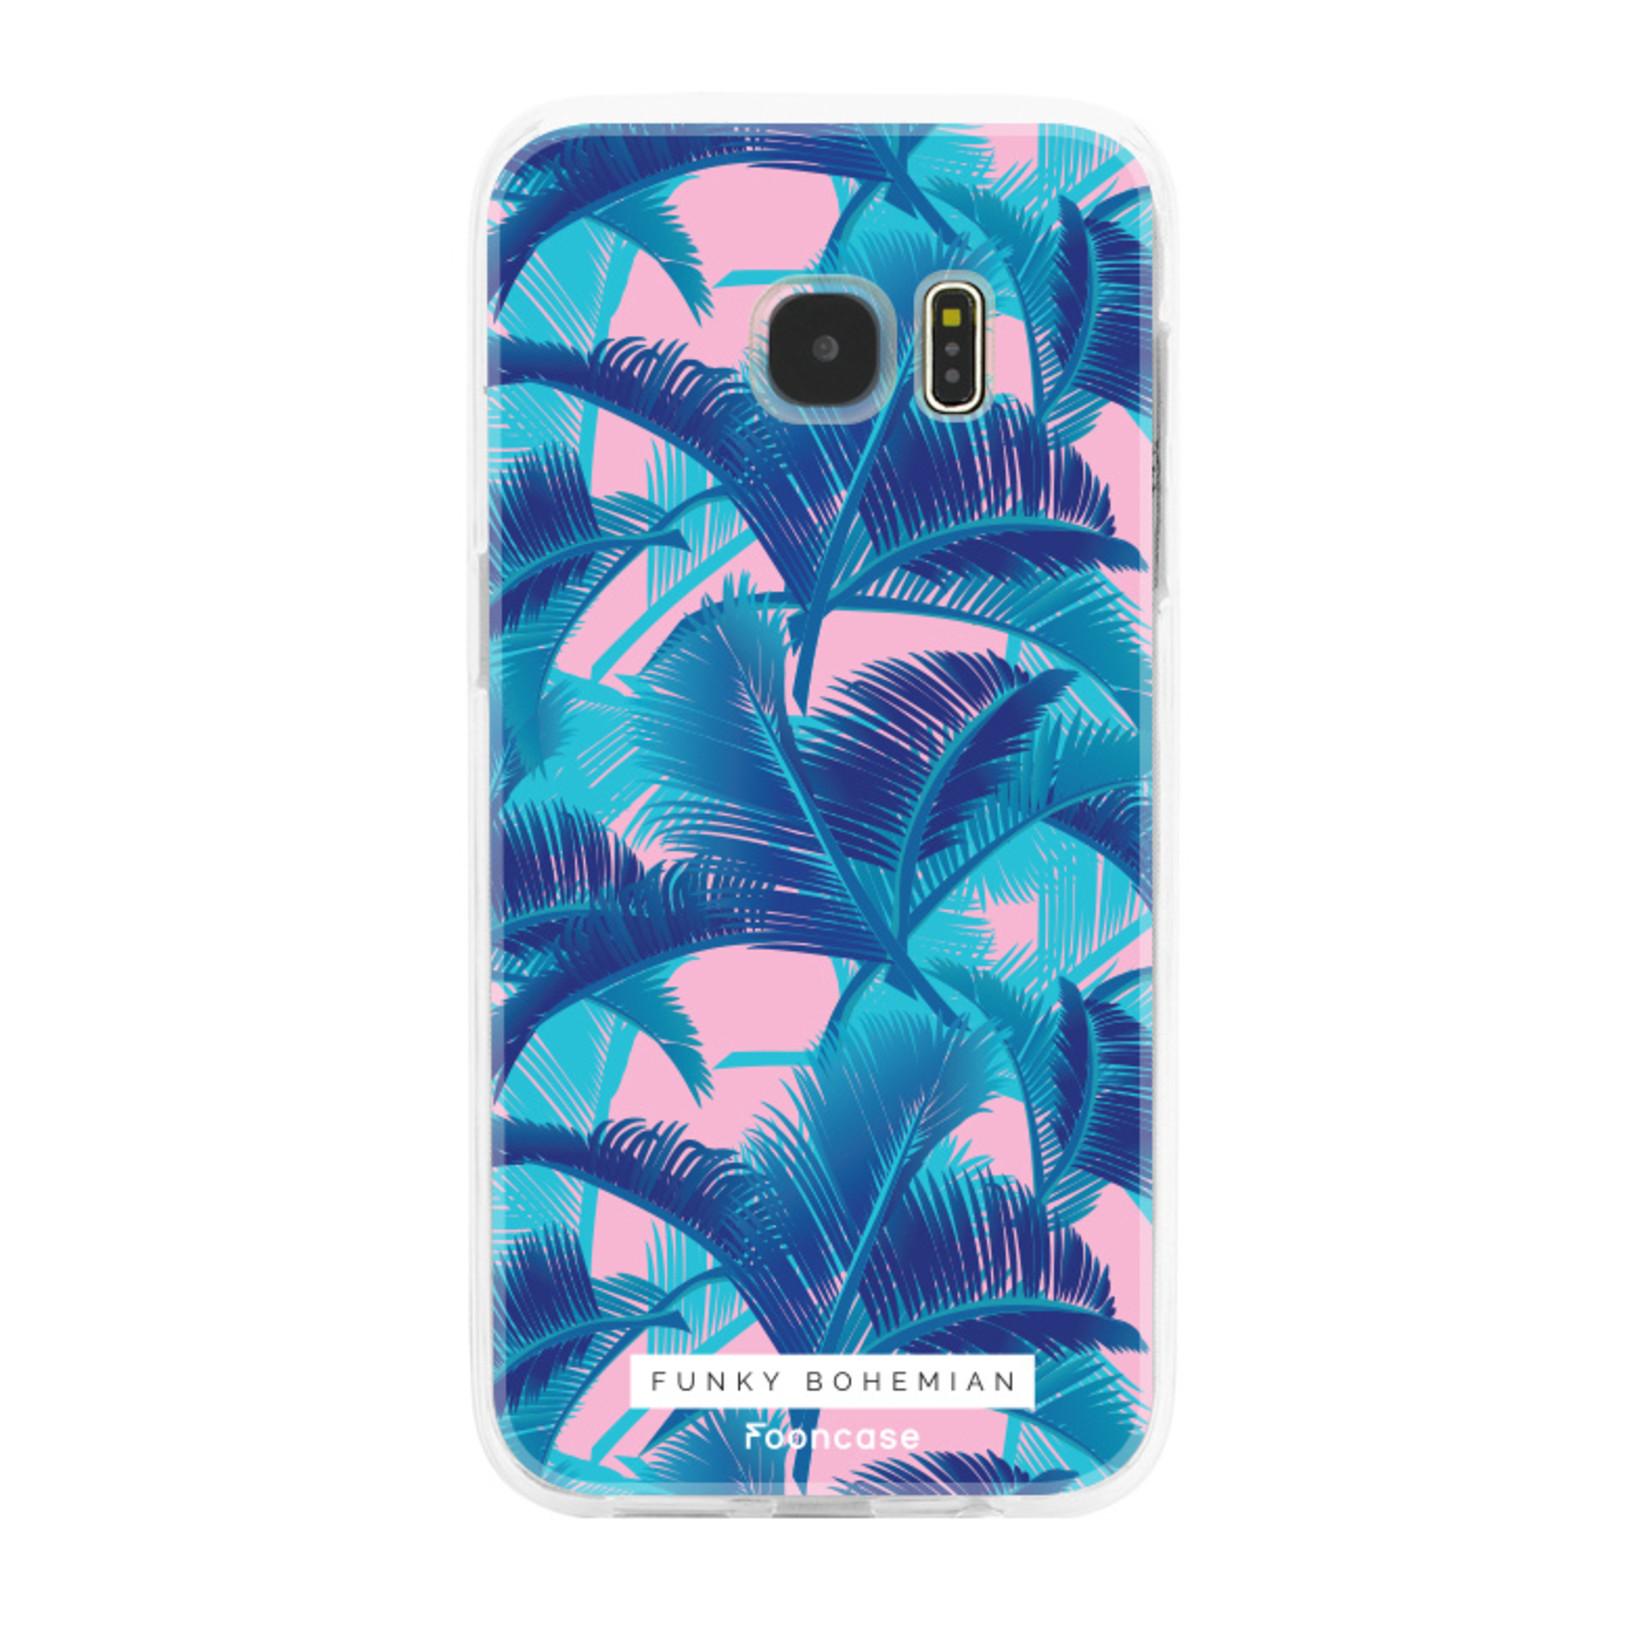 FOONCASE Samsung Galaxy S7 Edge Handyhülle - Funky Bohemian